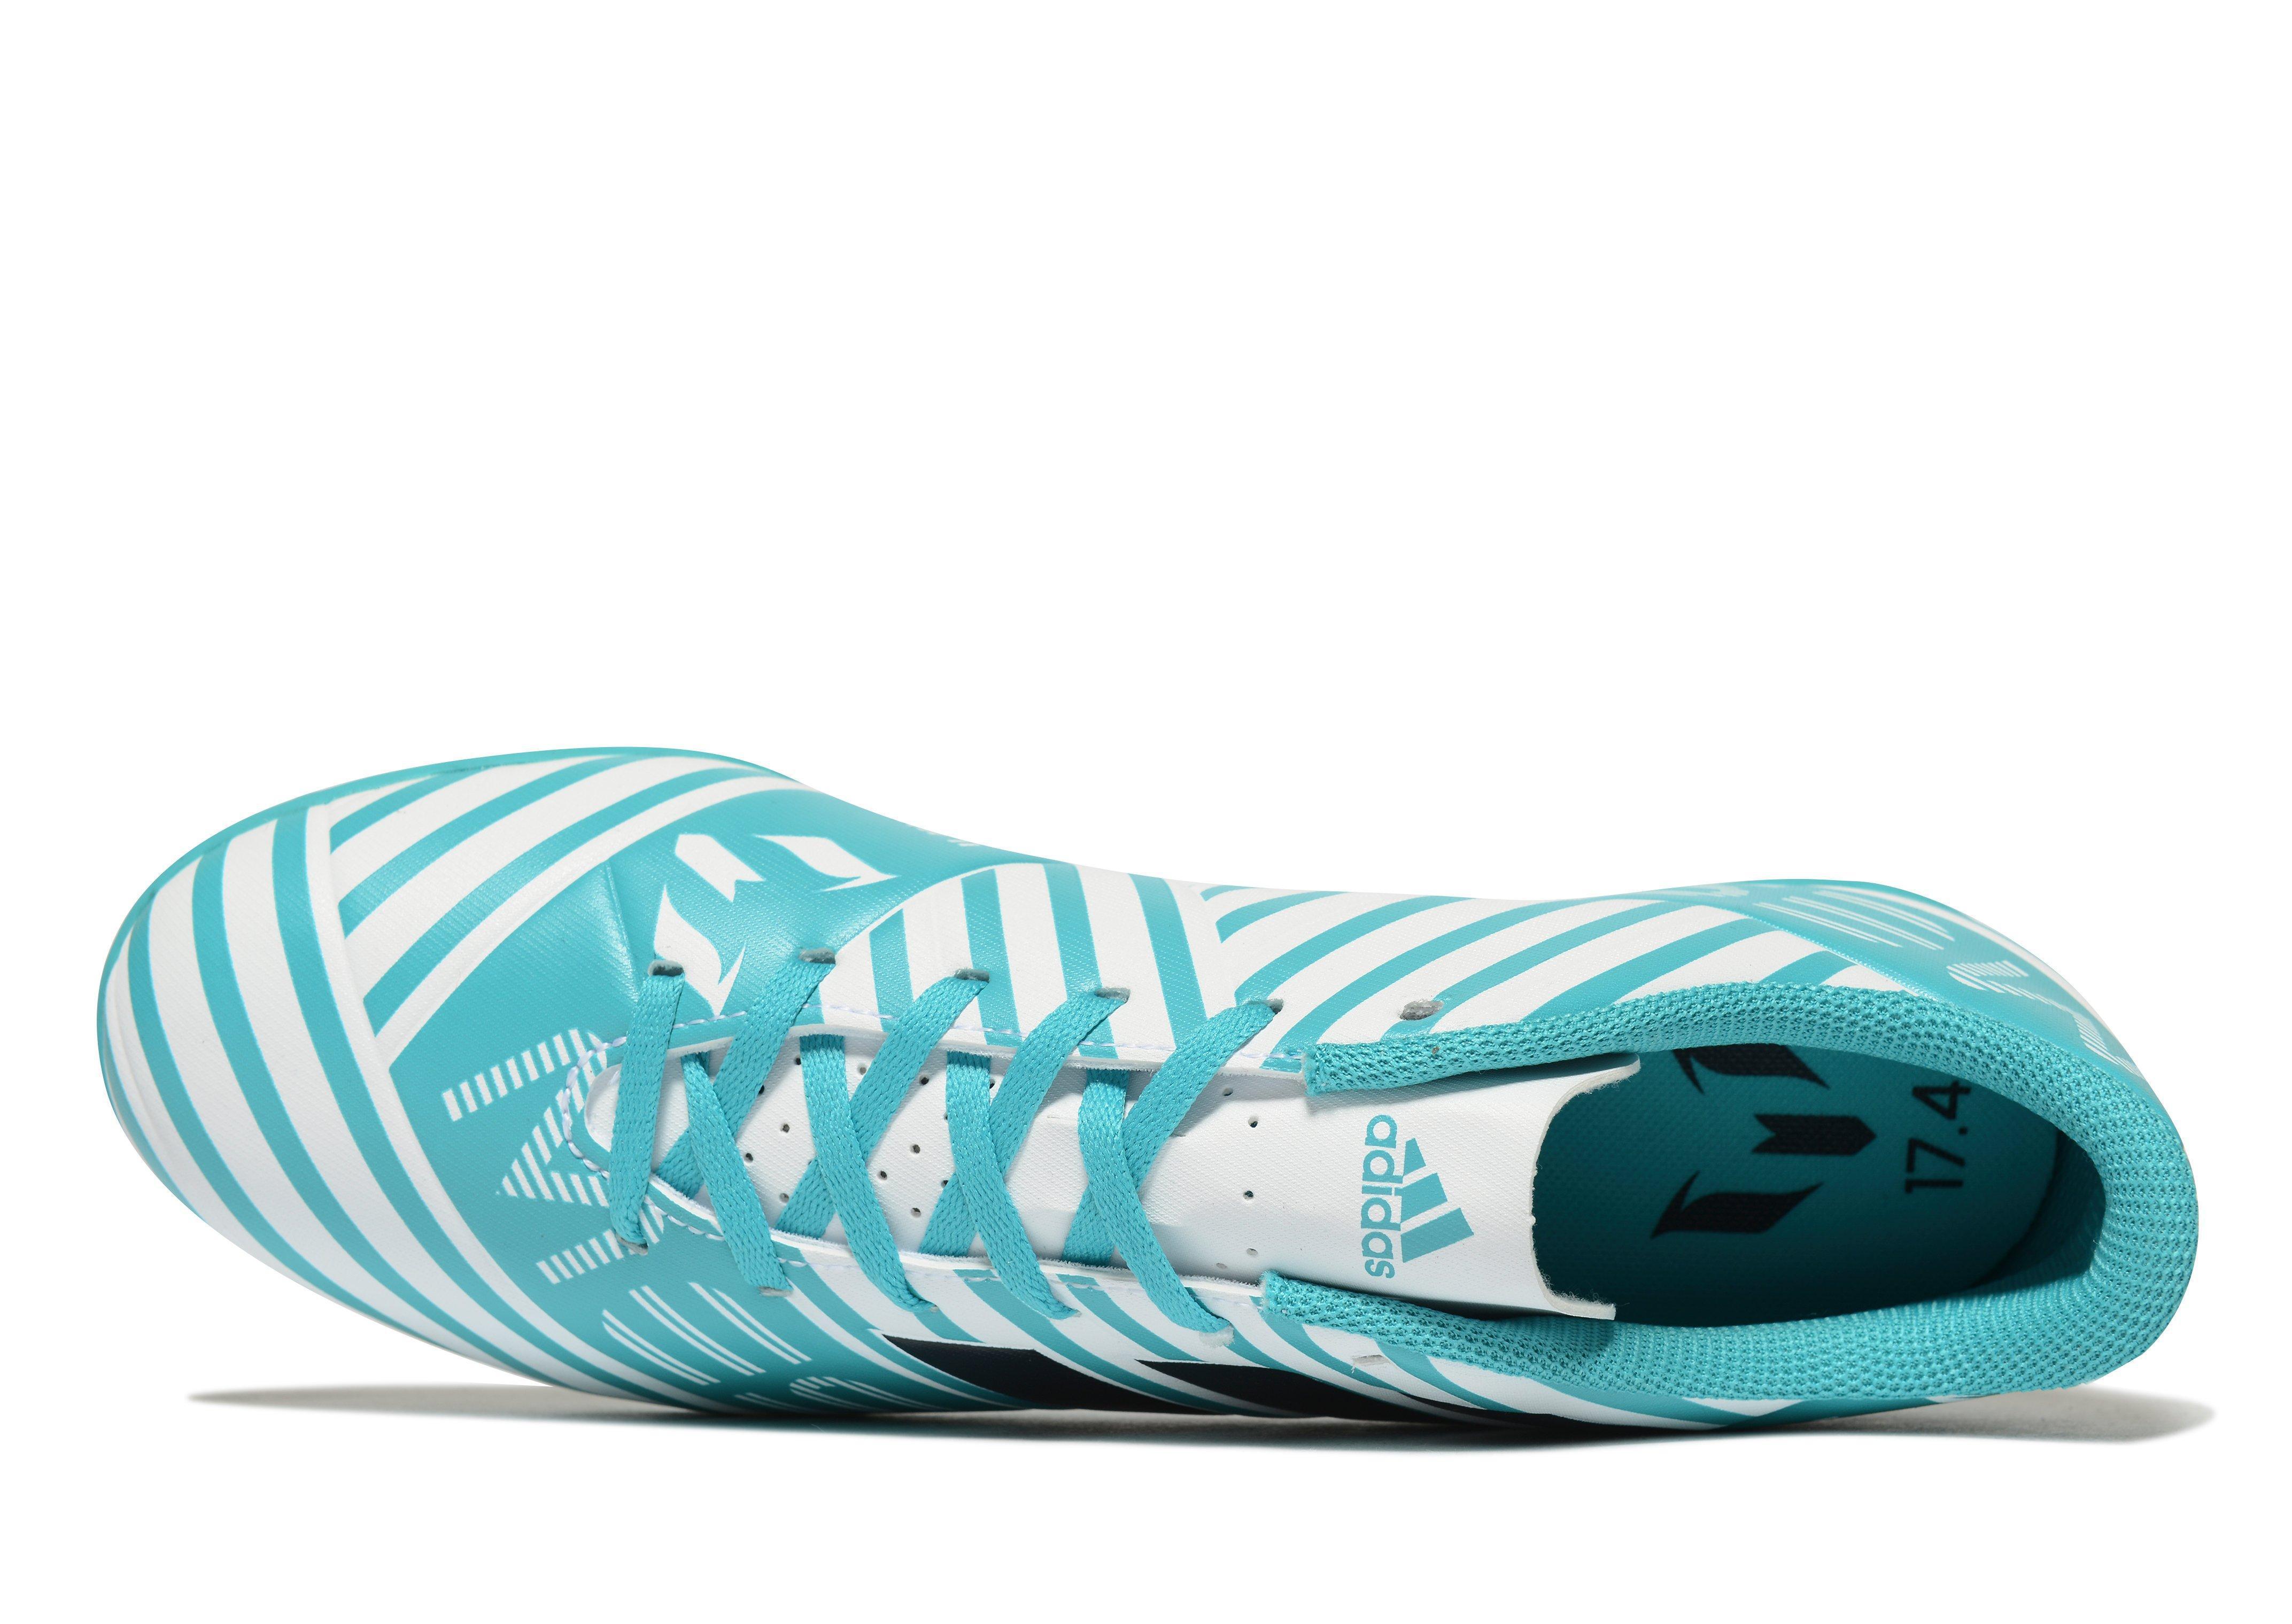 adidas Synthetic Ocean Storm Nemeziz 17.4 Tf Messi in White/Blue (Blue) for Men